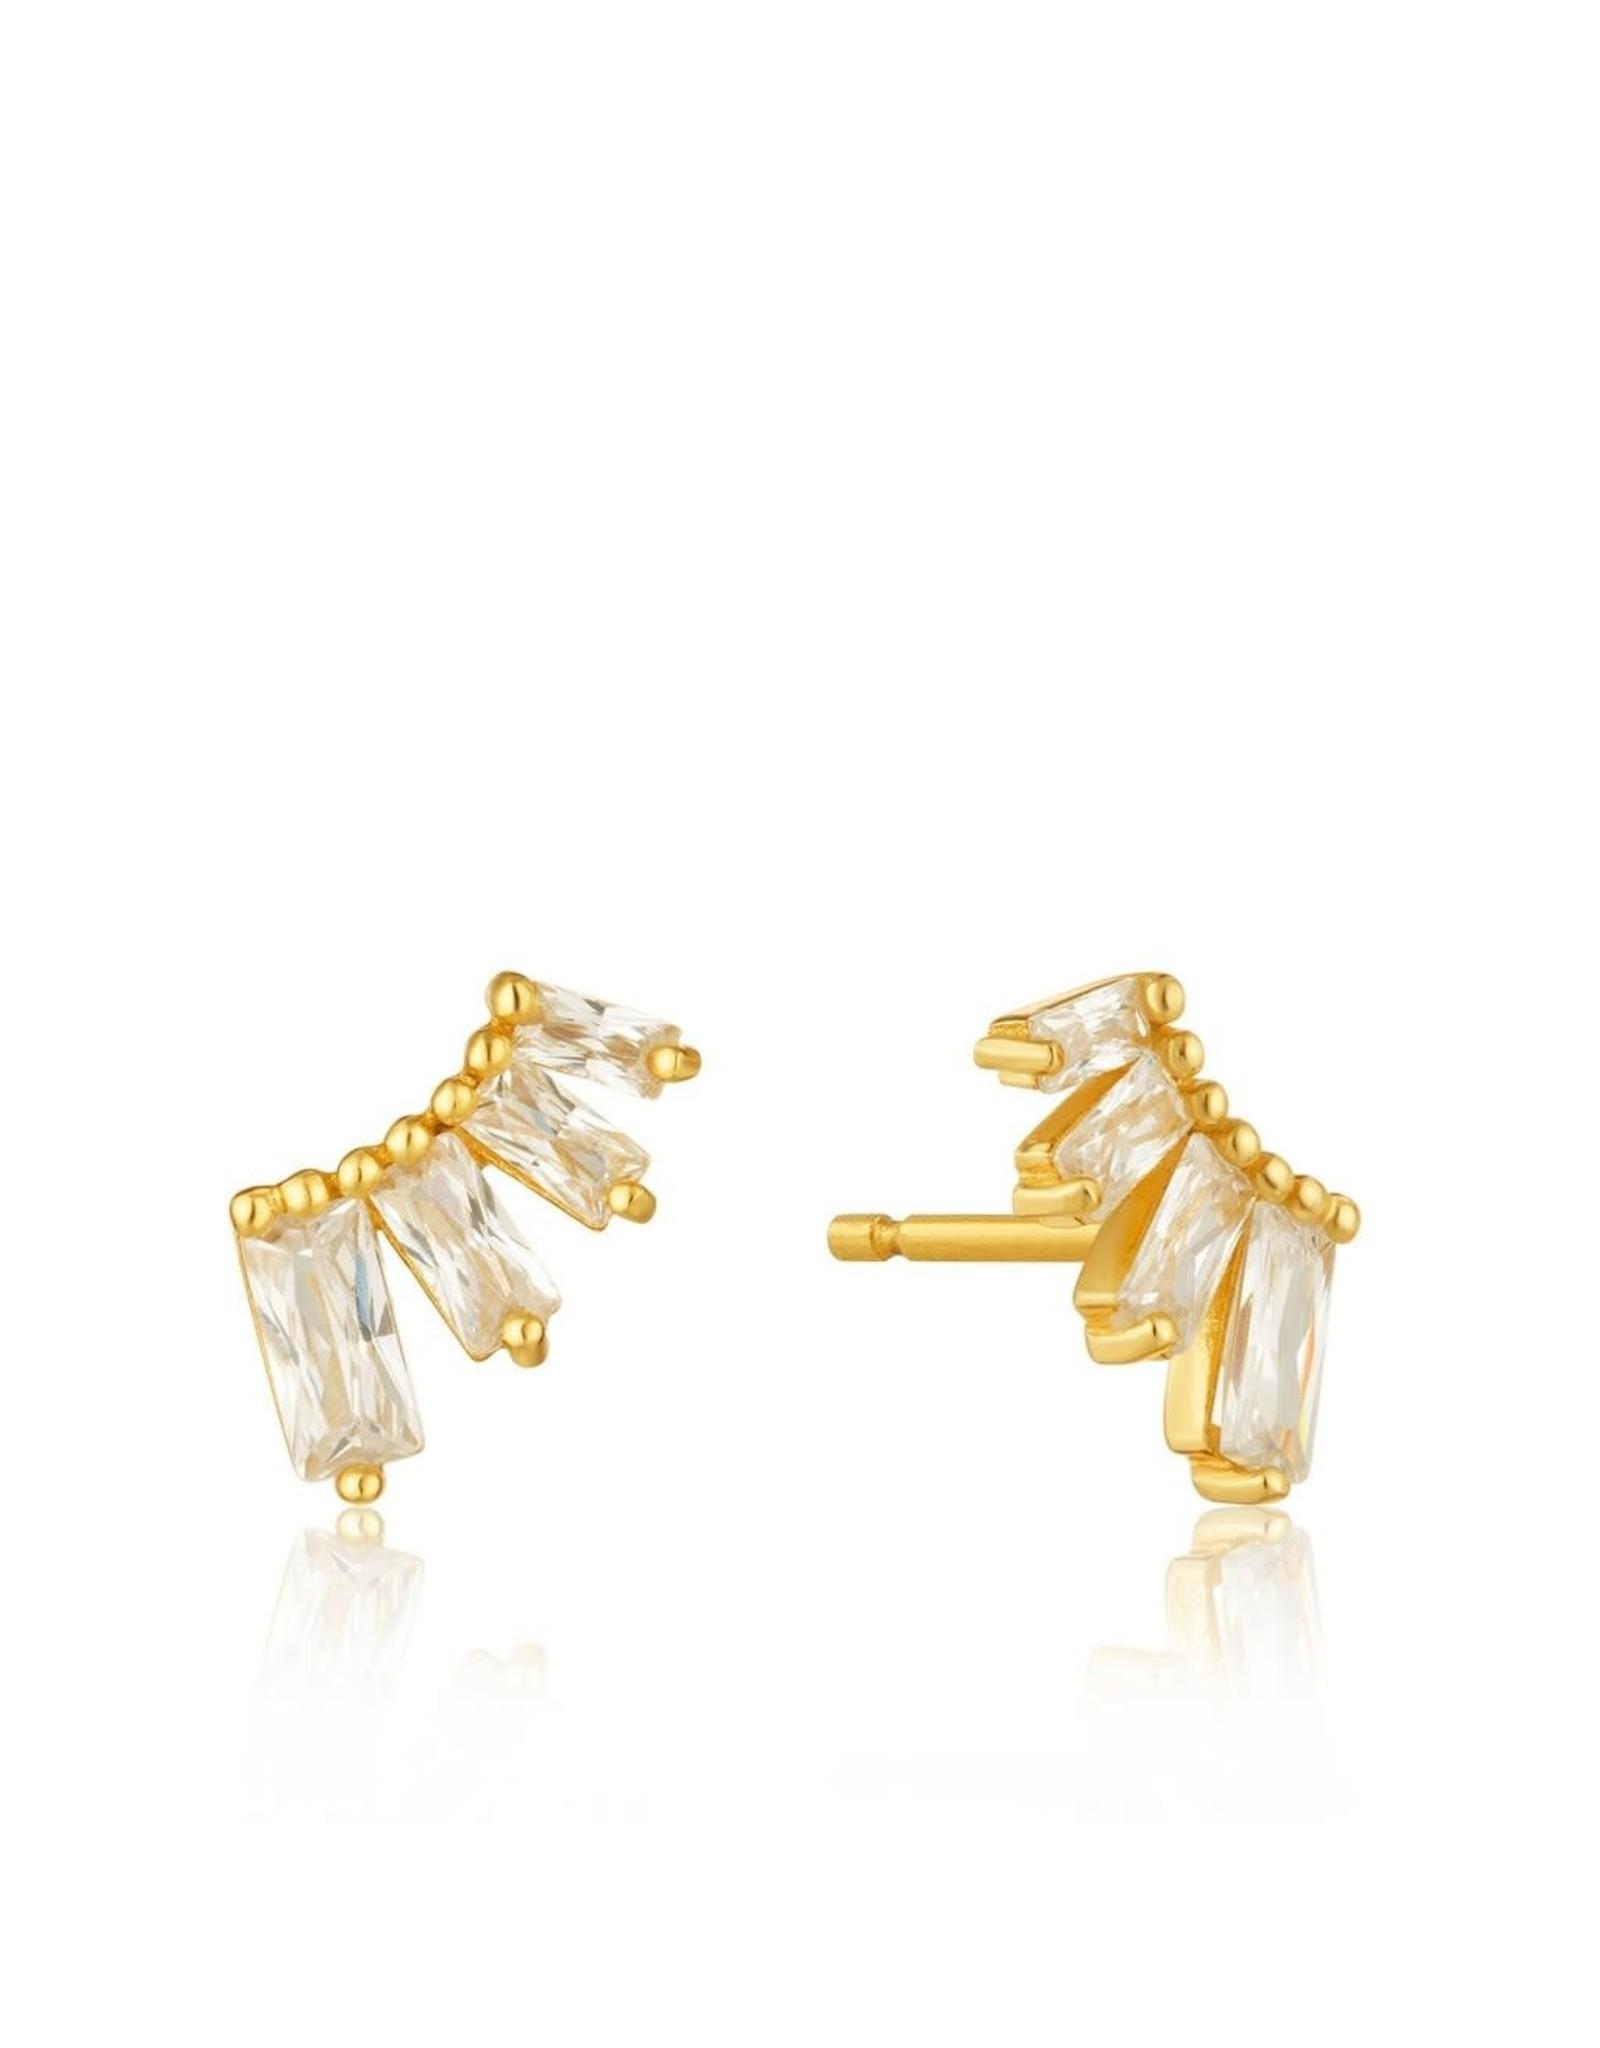 Ania Haie Glow Bar Stud Earrings